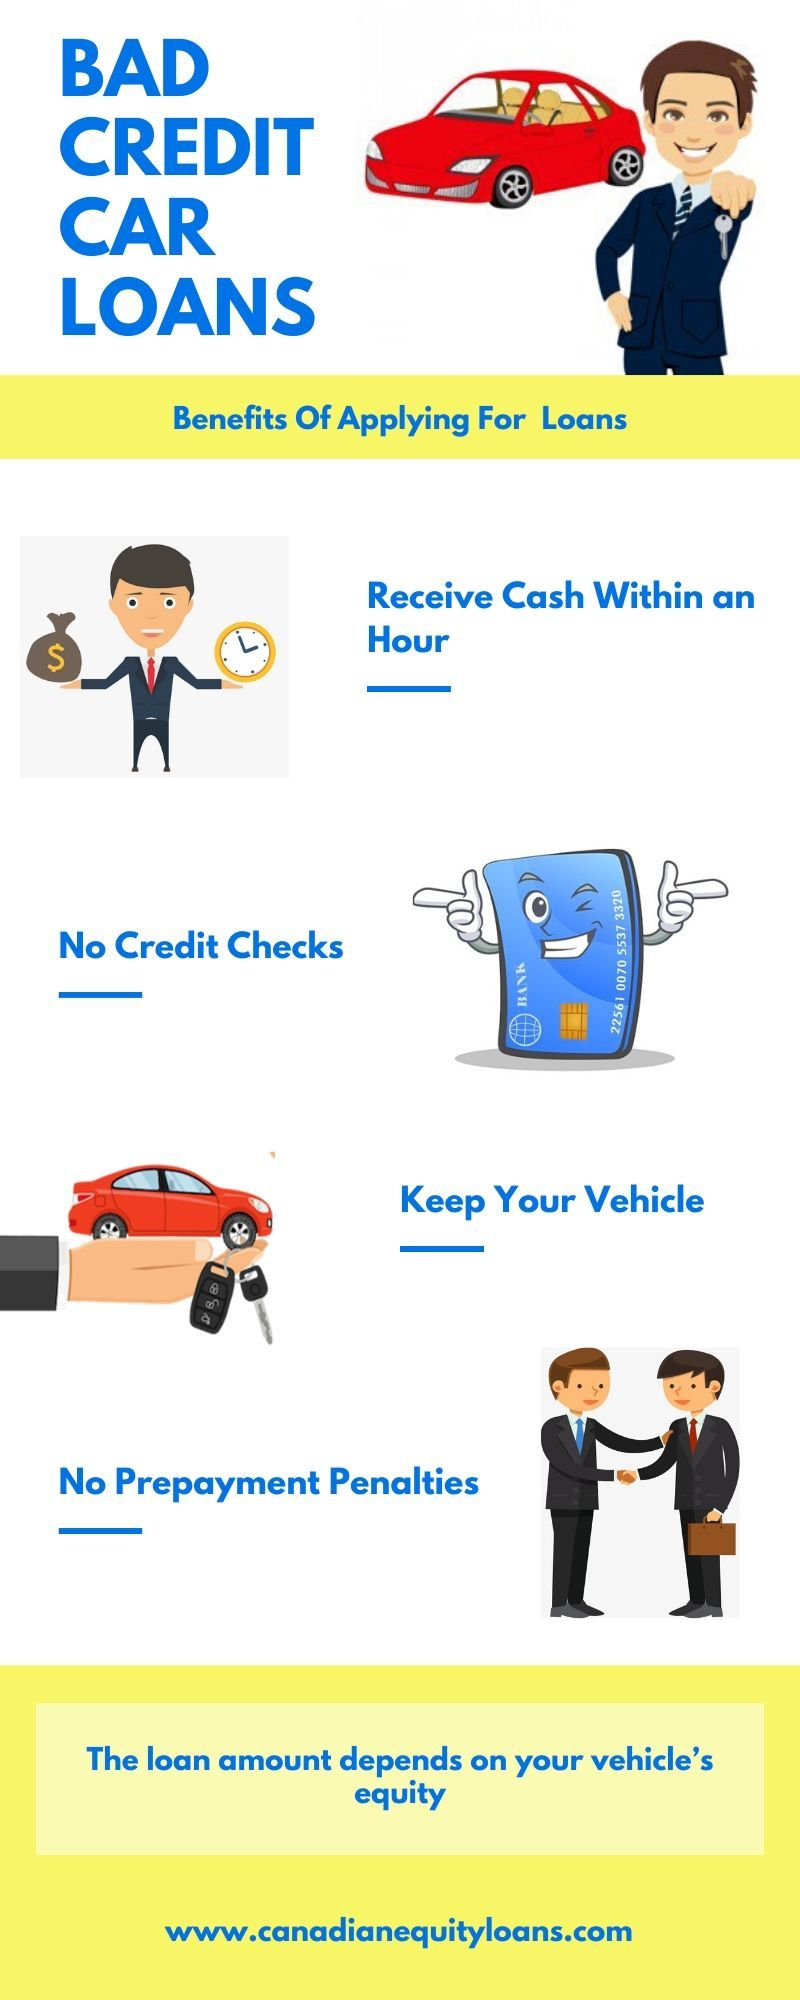 Bad Credit Car Loans Calgary Get Quick Approval In 2020 Bad Credit Car Loan Bad Credit Loans For Bad Credit